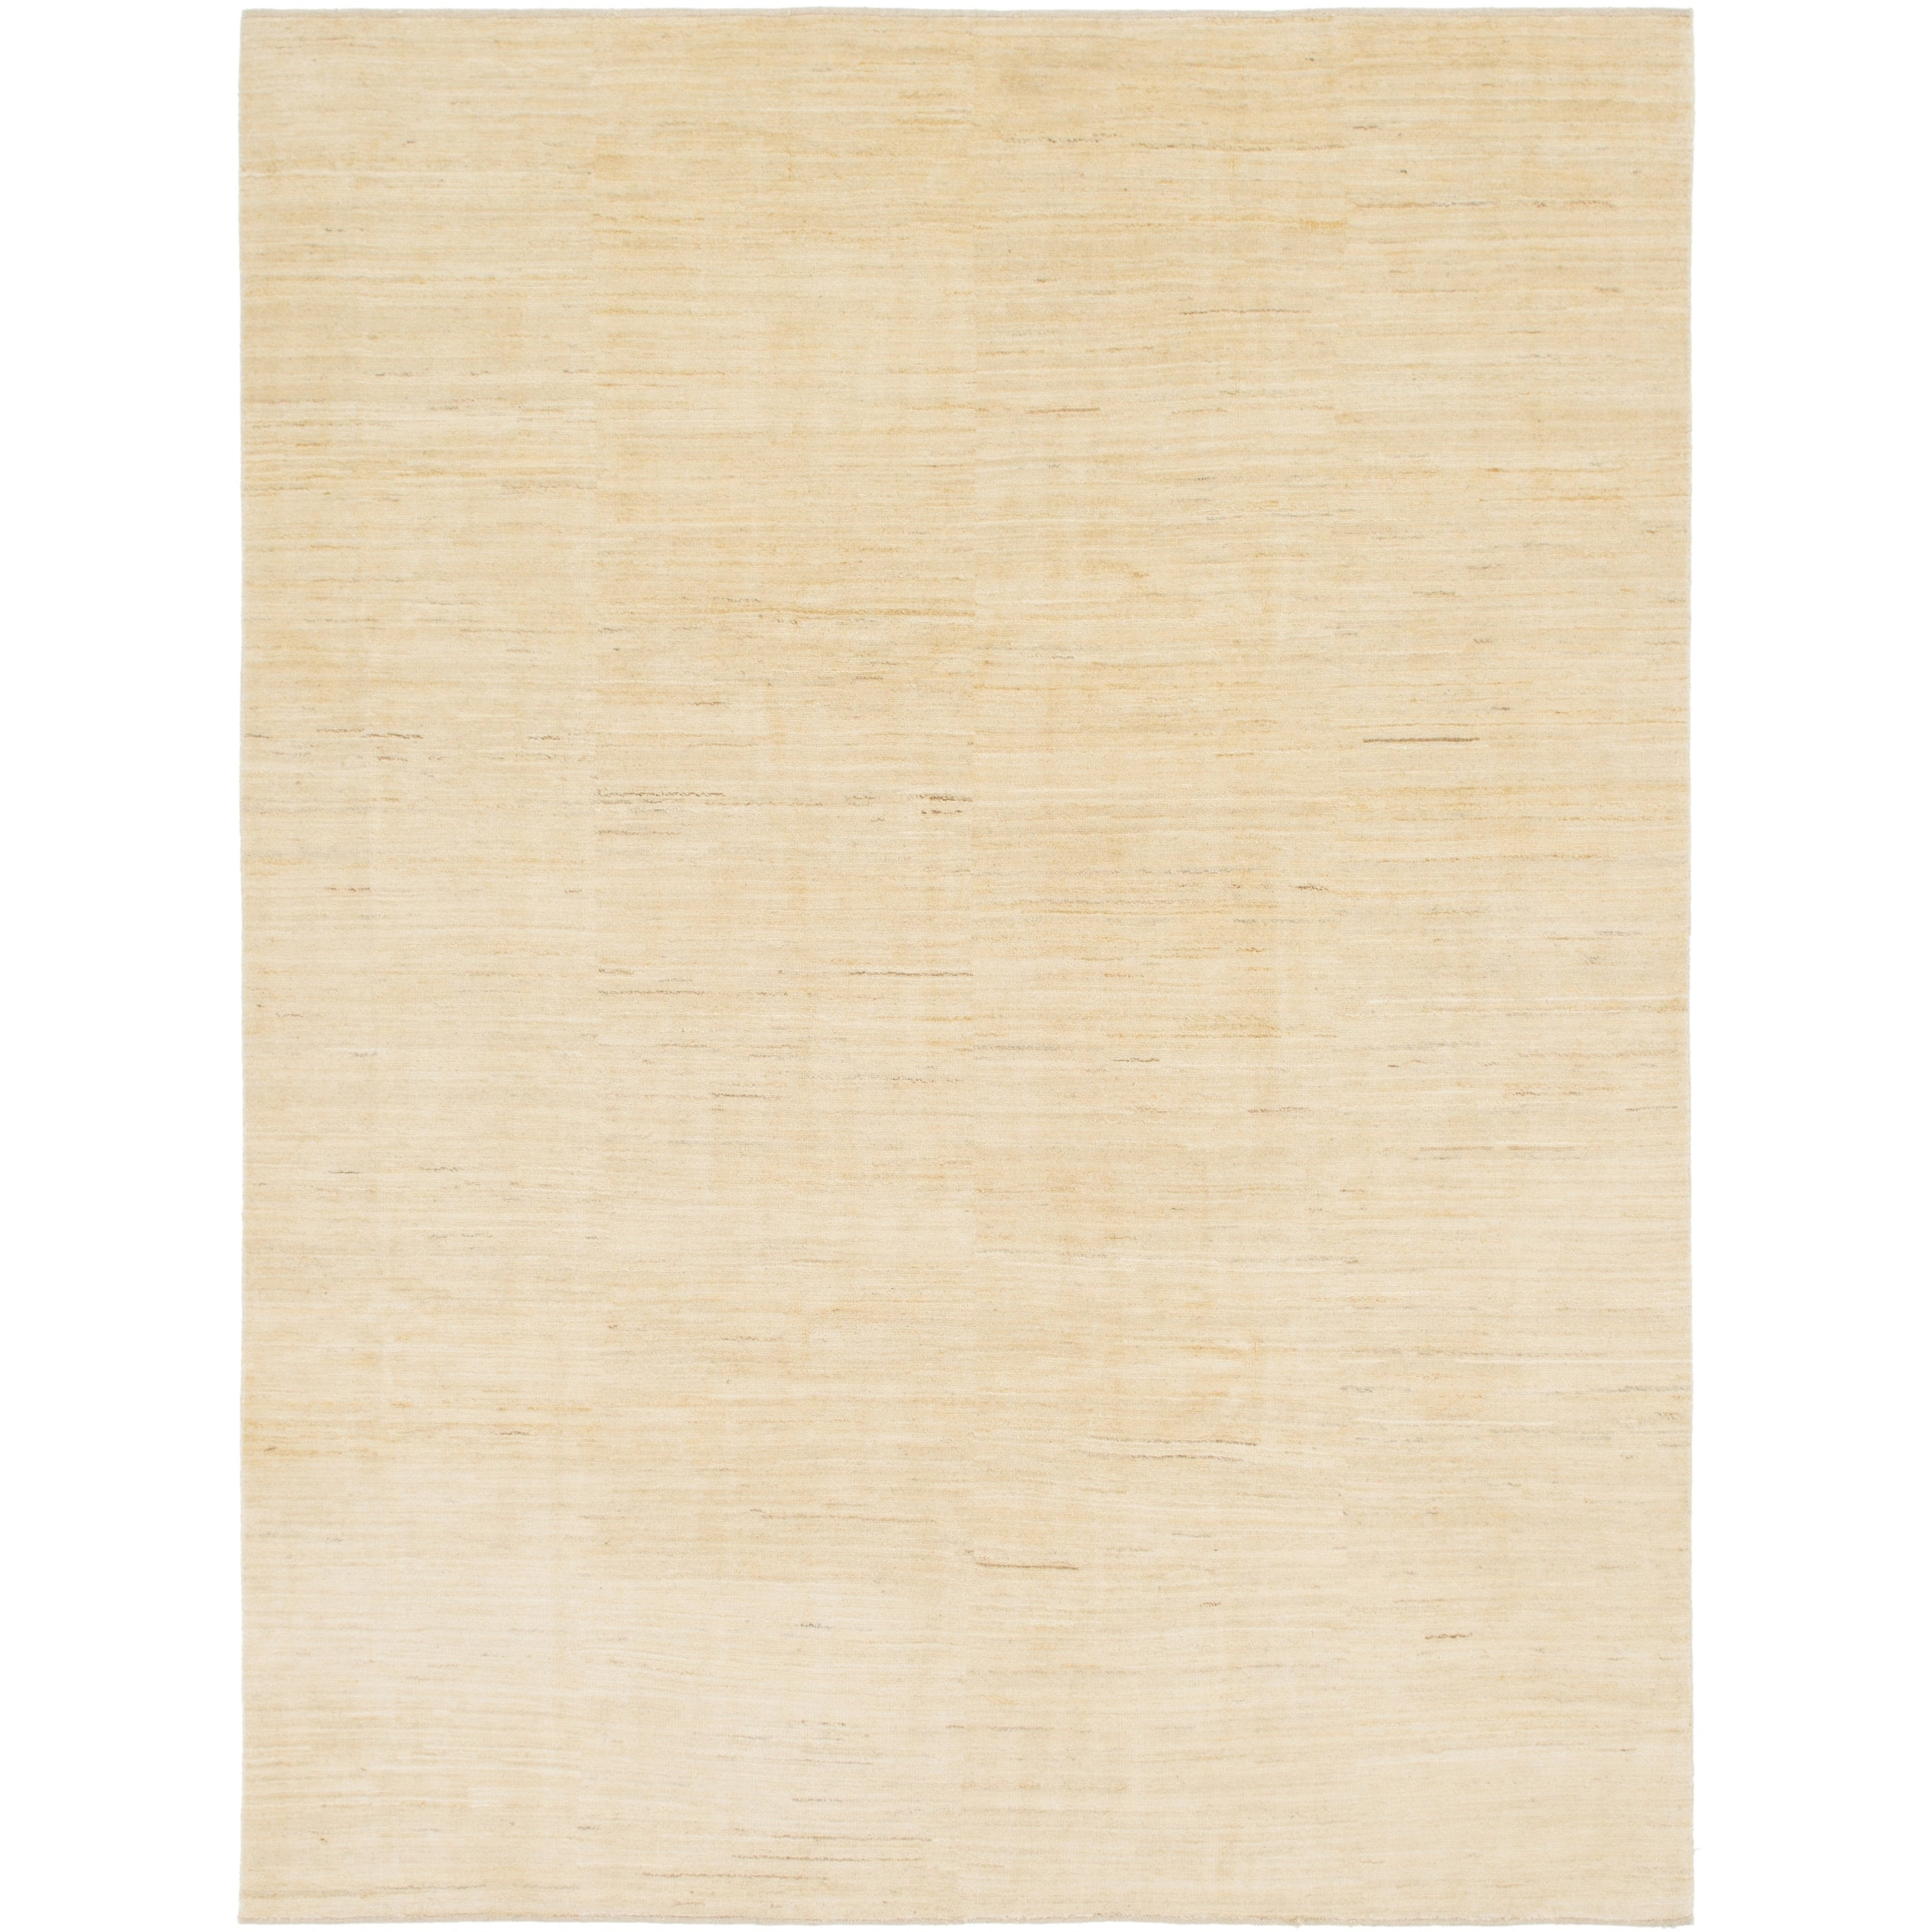 Hand Knotted Kashkuli Gabbeh Wool Area Rug - 8 4 x 10 10 (Cream - 8 4 x 10 10)